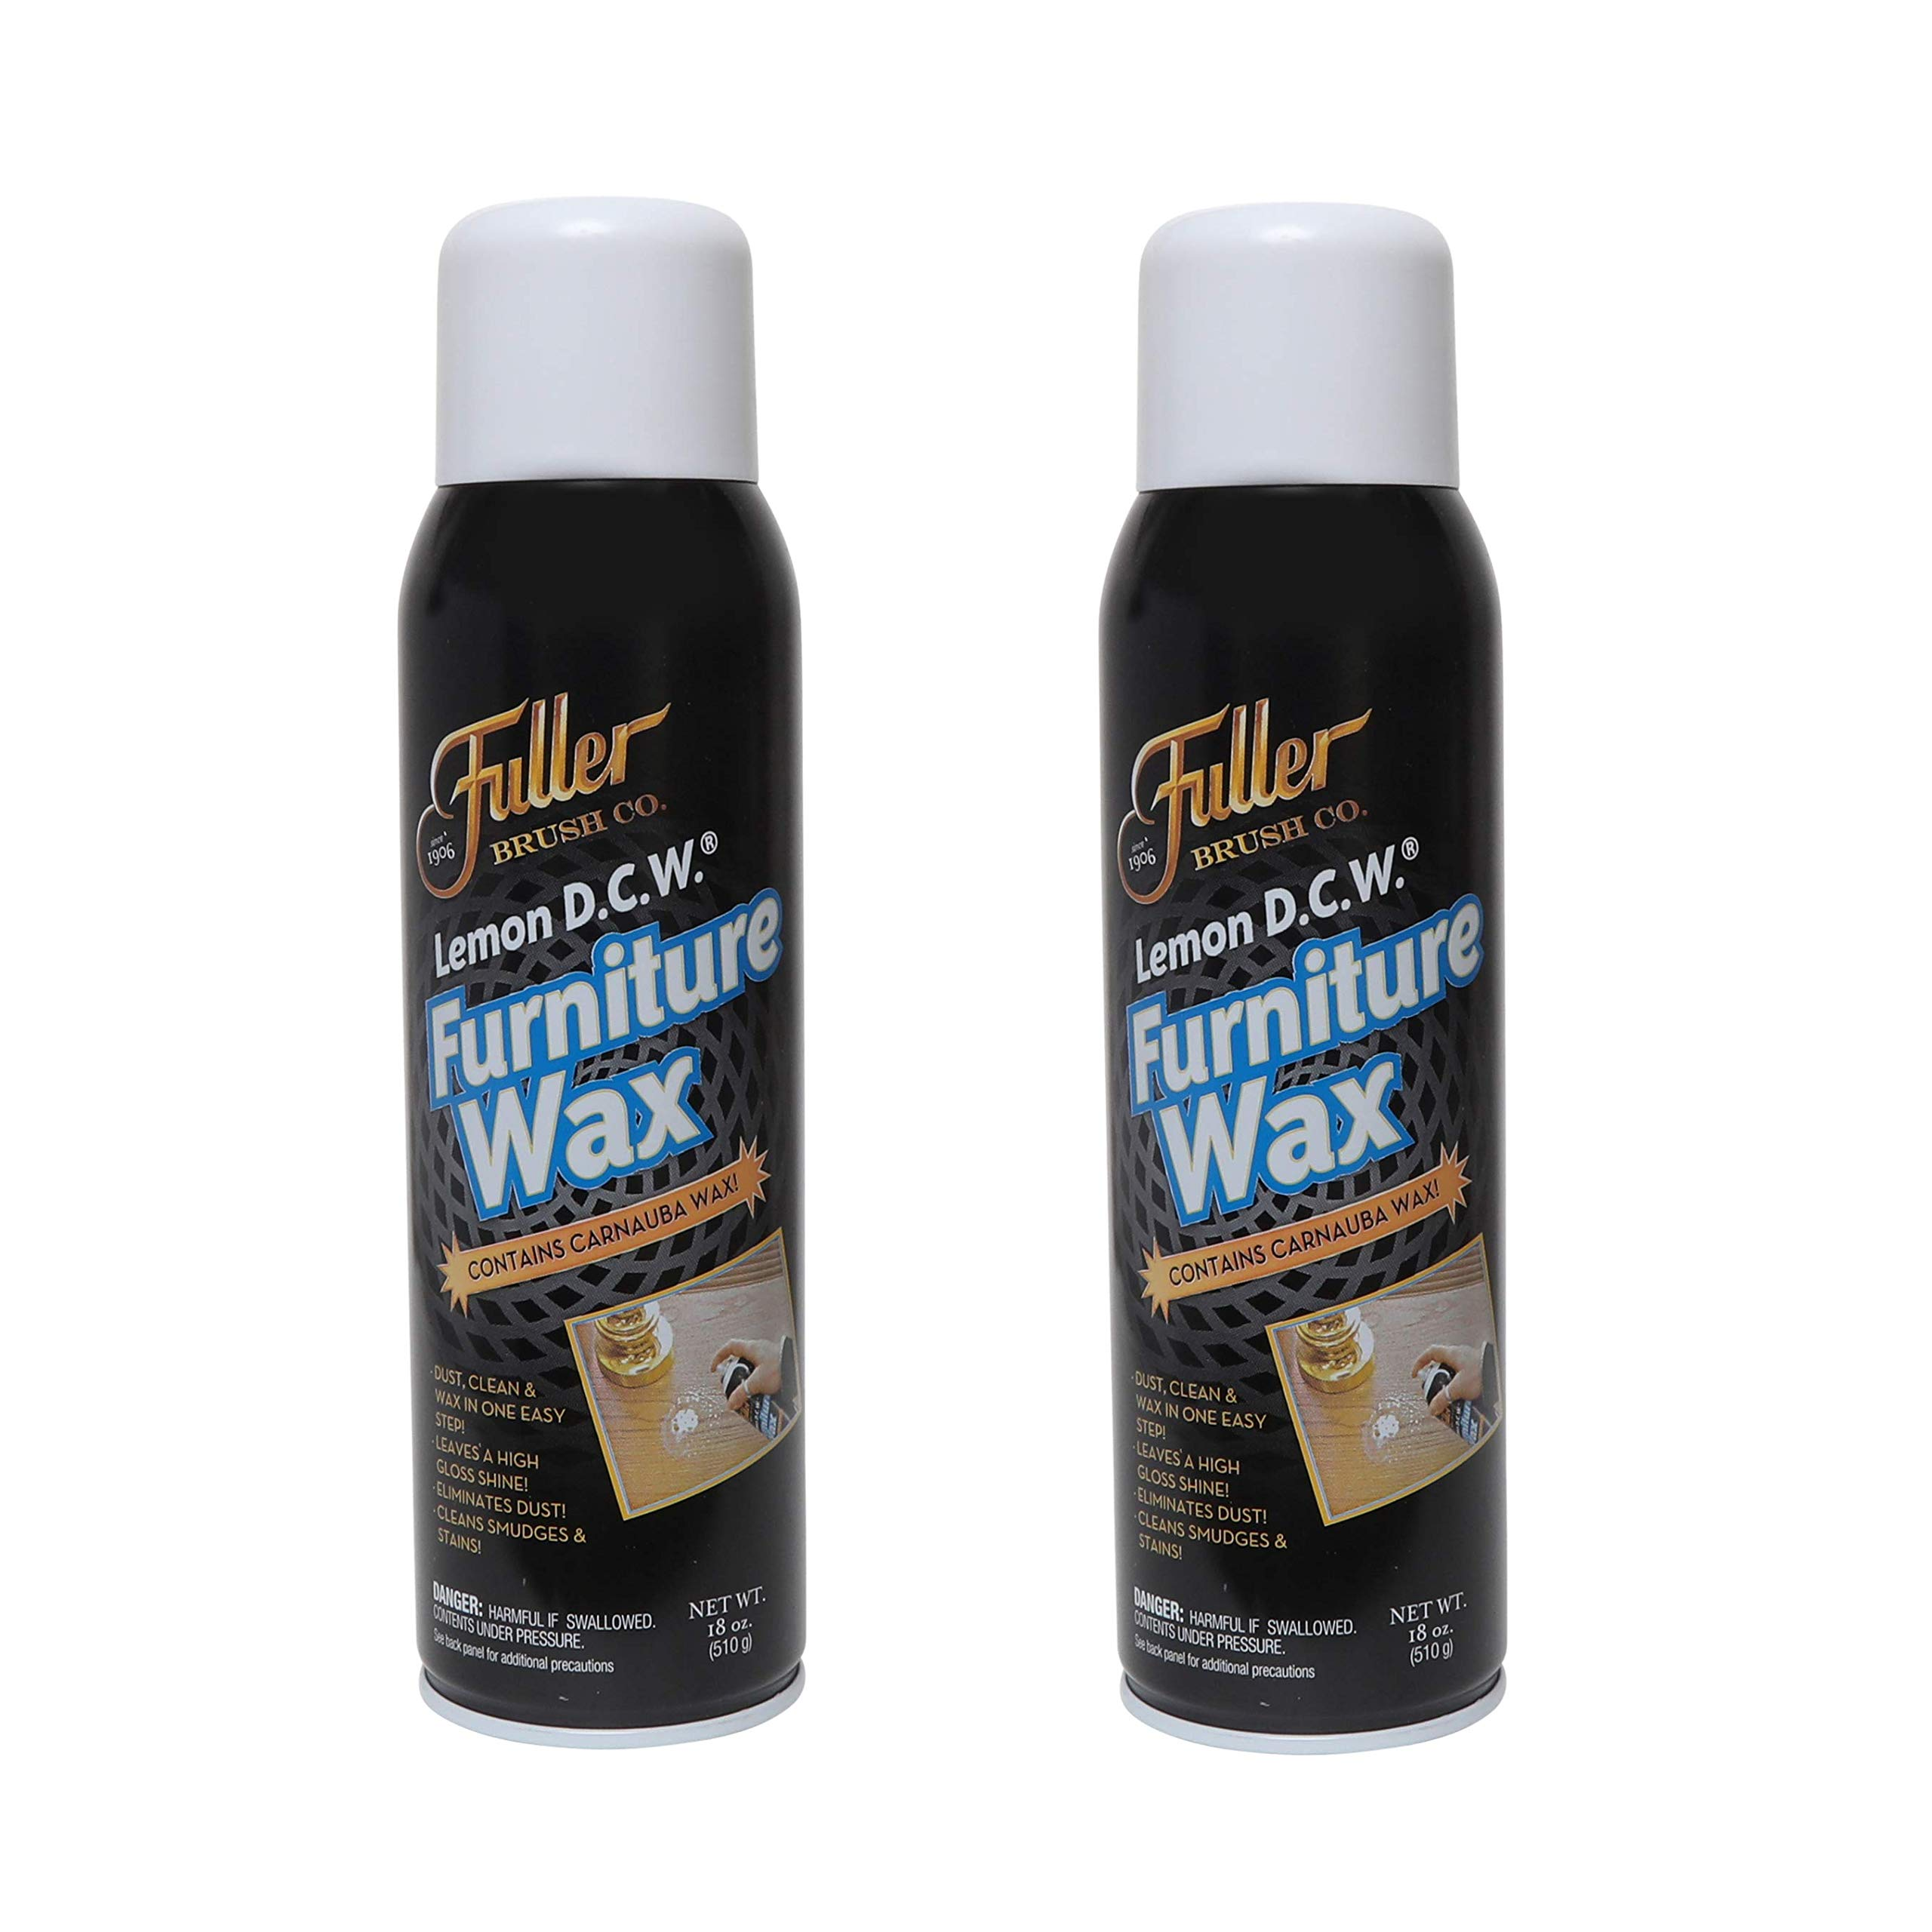 Fuller Brush Lemon D.C.W. Furniture Wax - Dust, Clean & Wax in One Spray - 18 oz. - 2 Pack